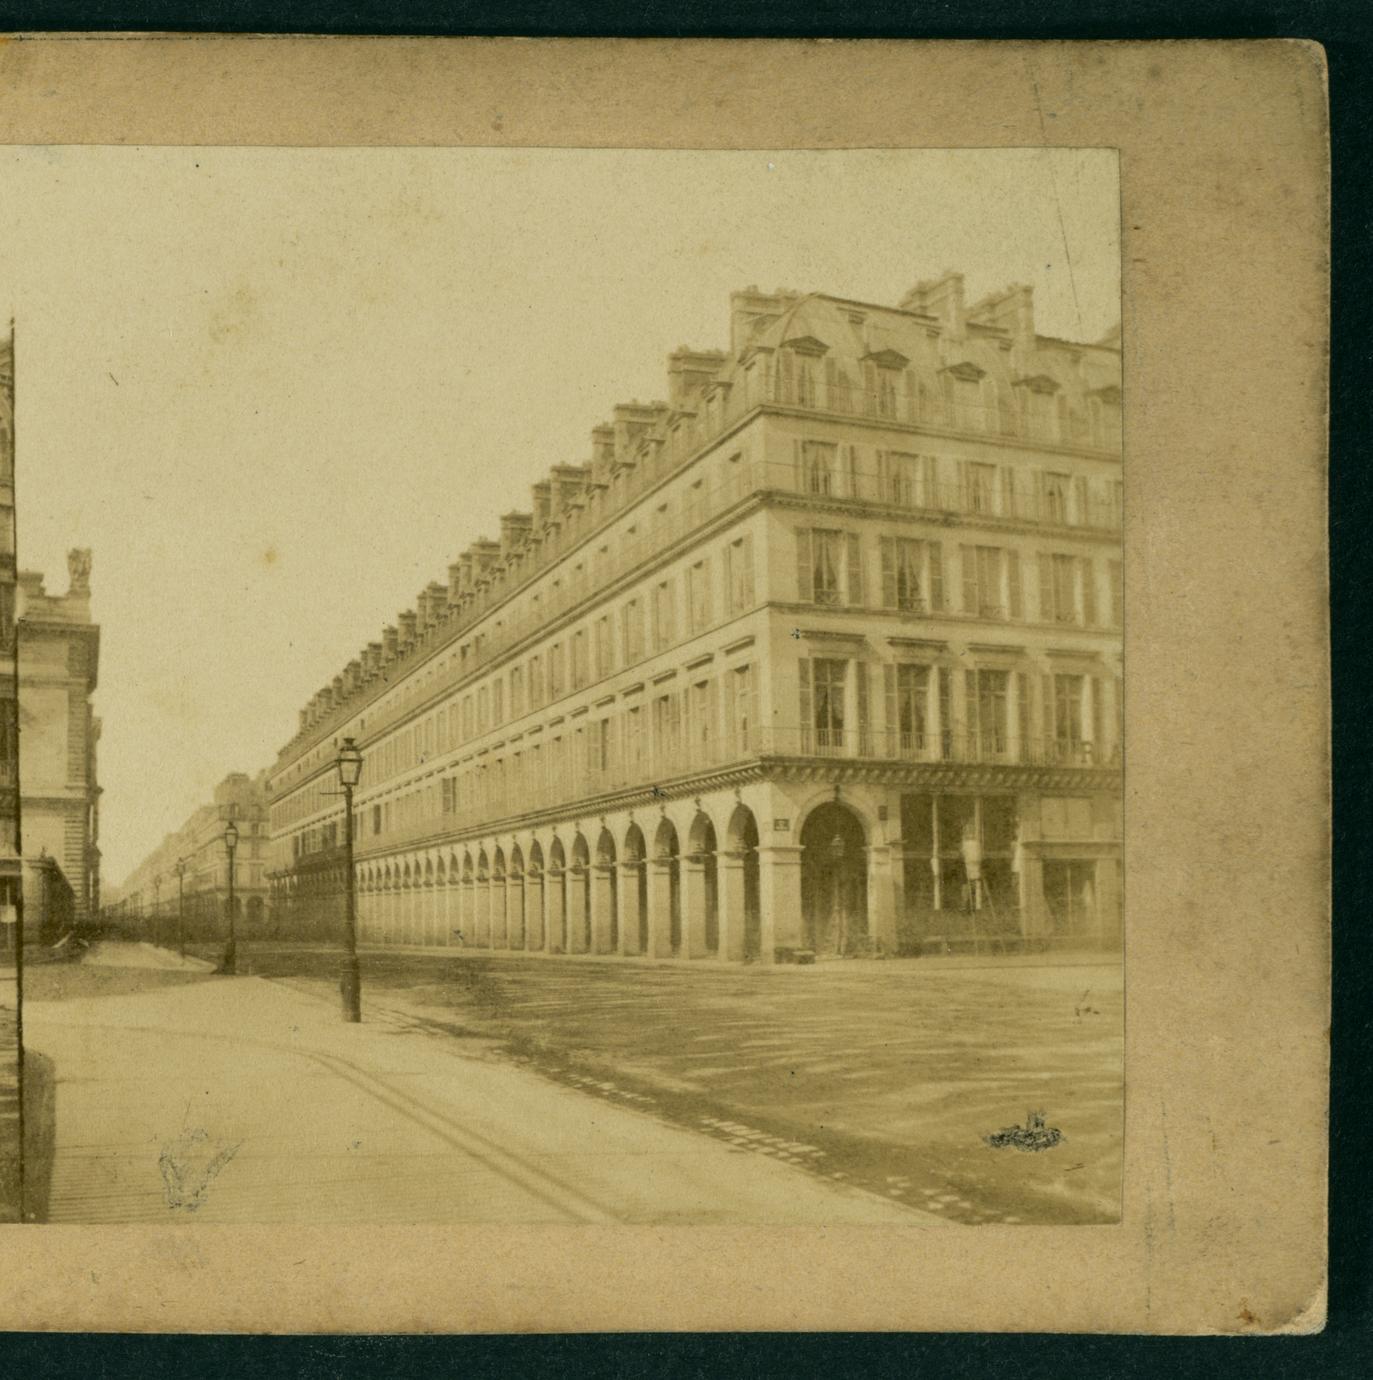 Hotel du Louvre, Rue Rivoli 168, Paris (2 of 2)